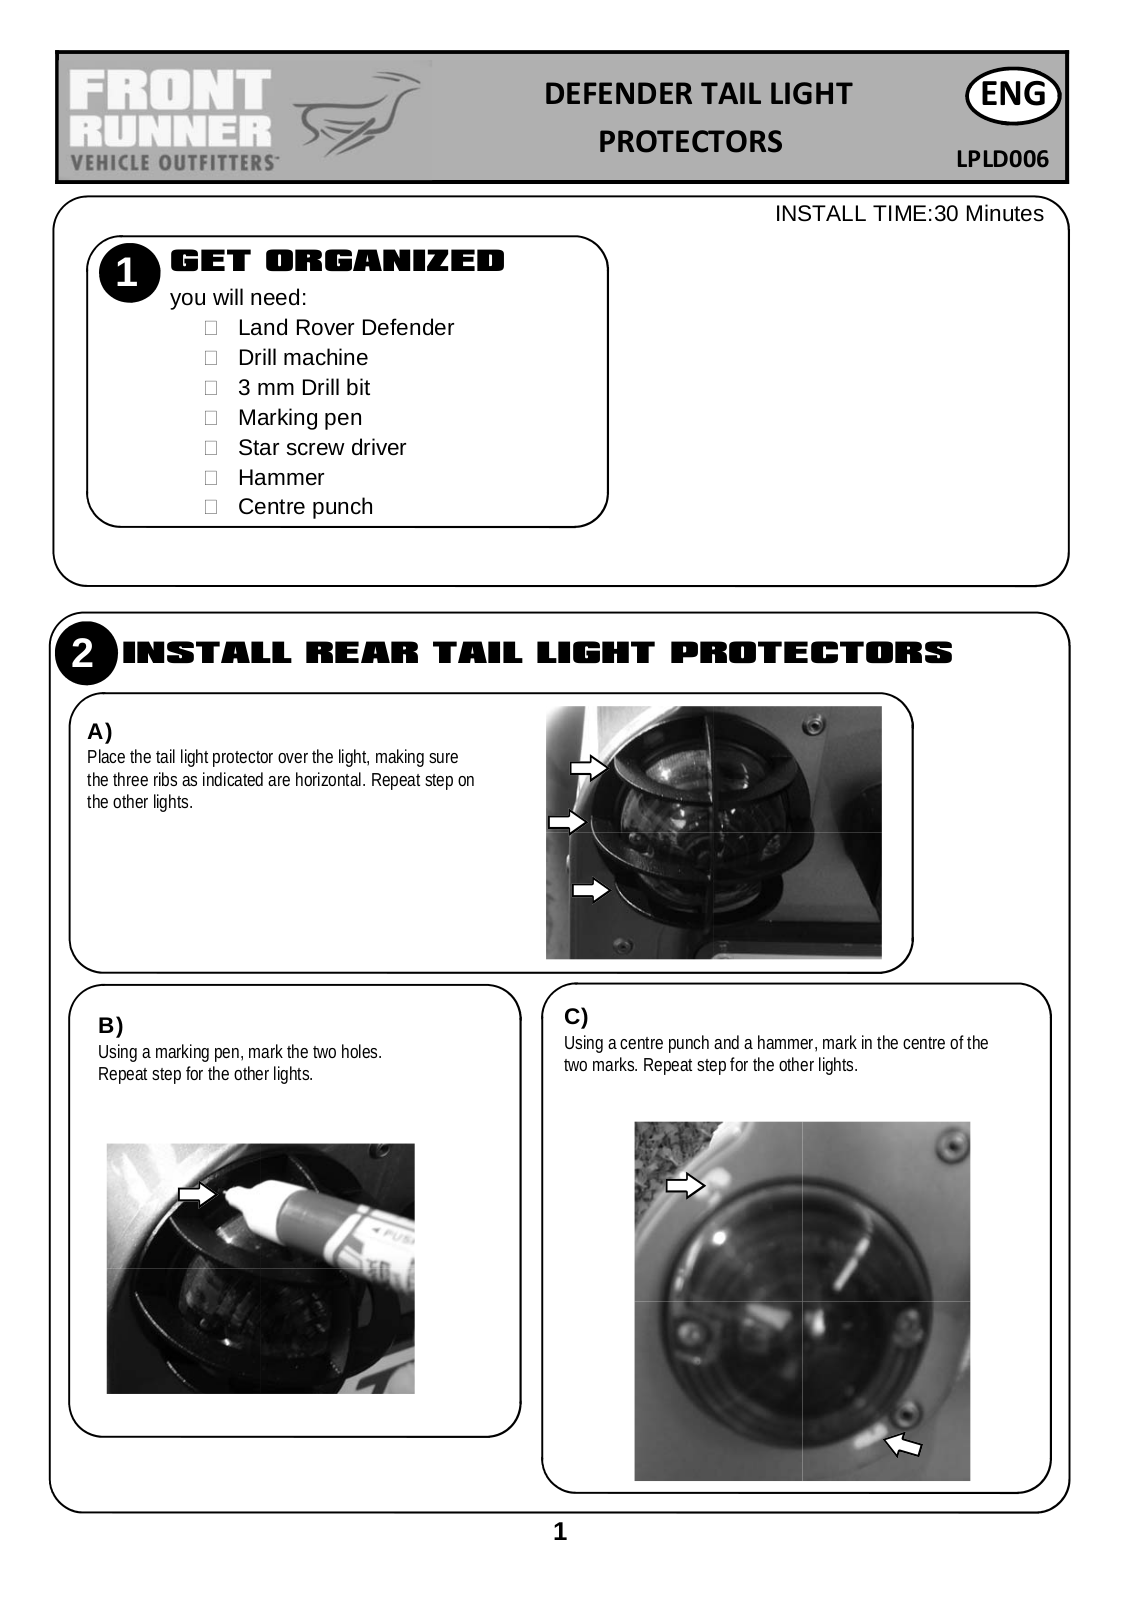 Installation instructions for LPLD006